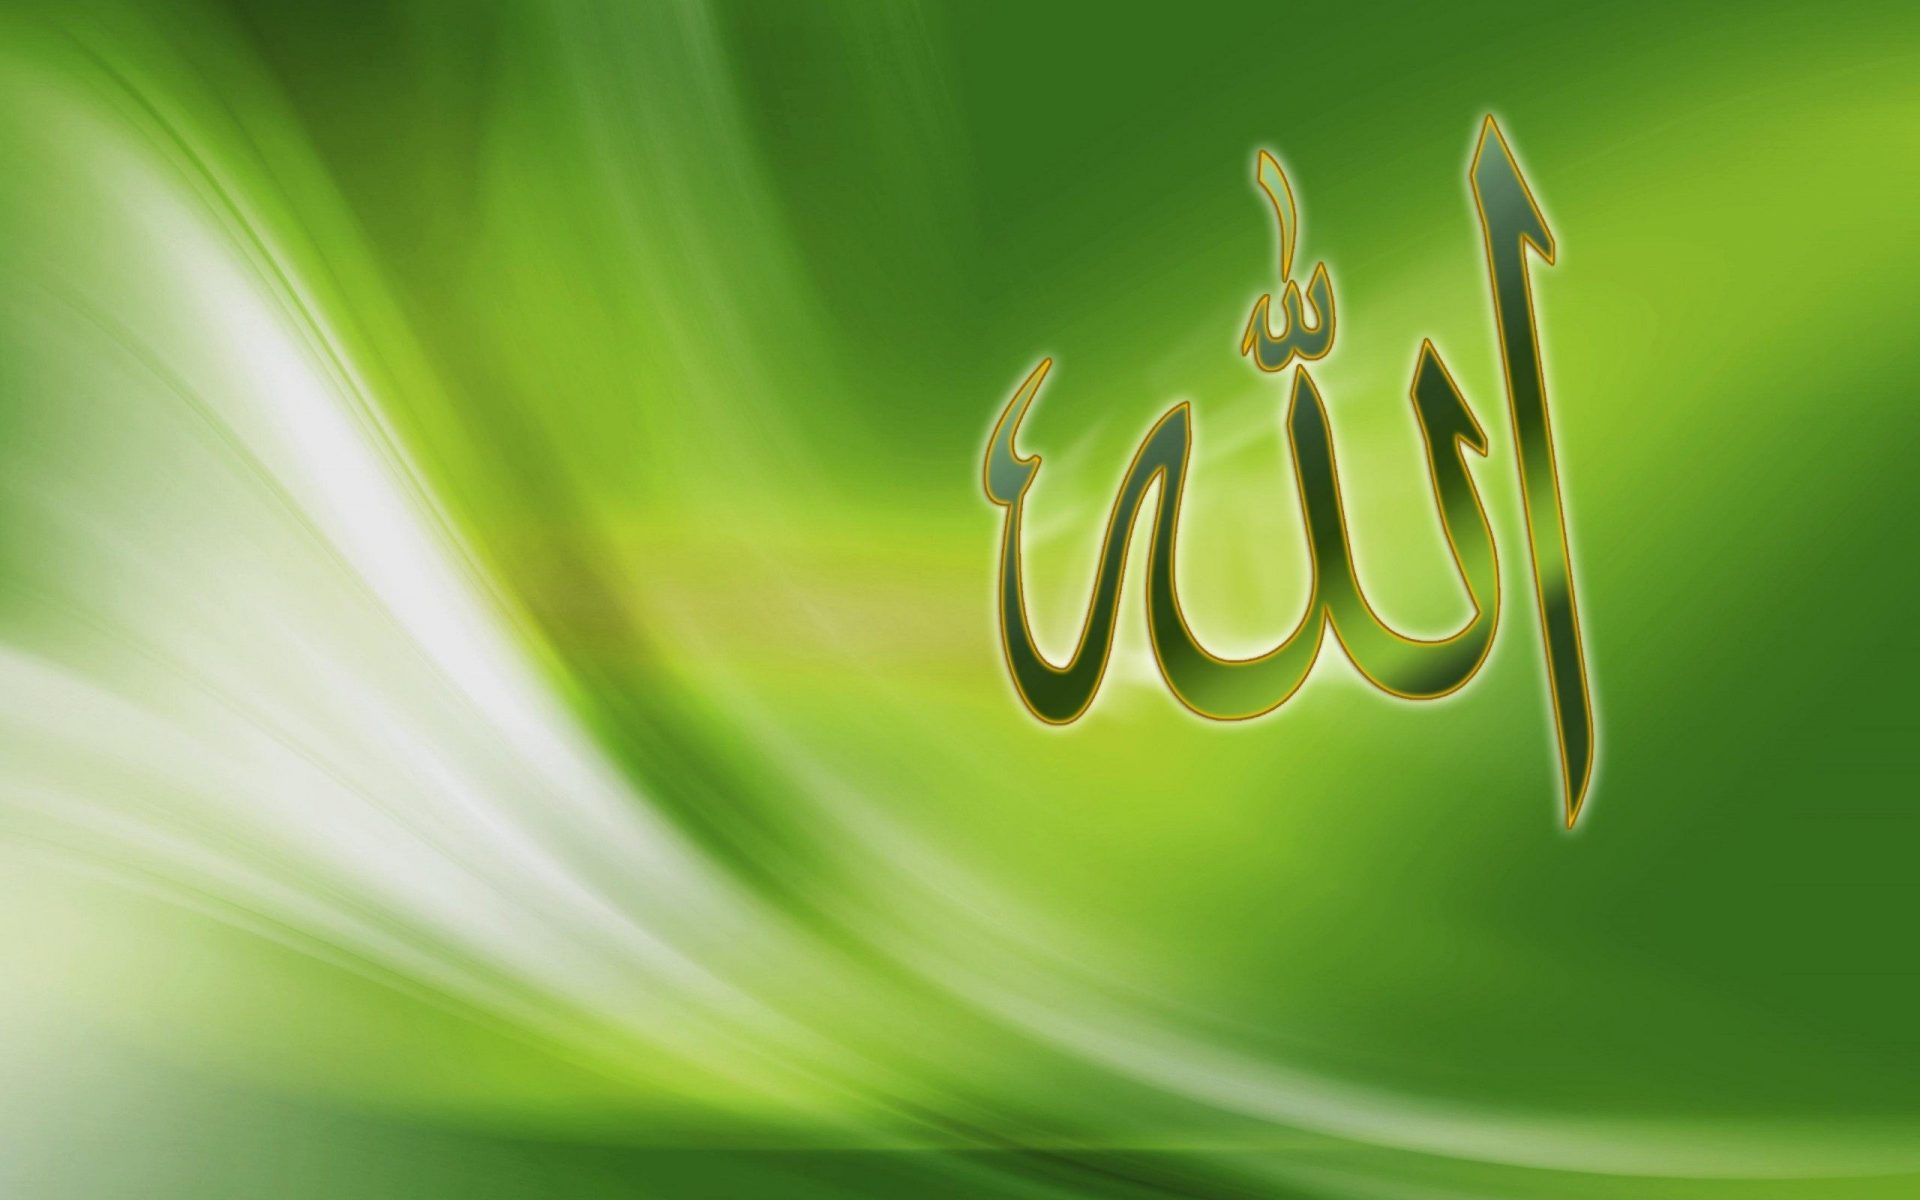 Wallpaper download free image - Full Hd Allah Name Wallpaper Desktop Wallpaper Download Free For Widescreen Mobile Table